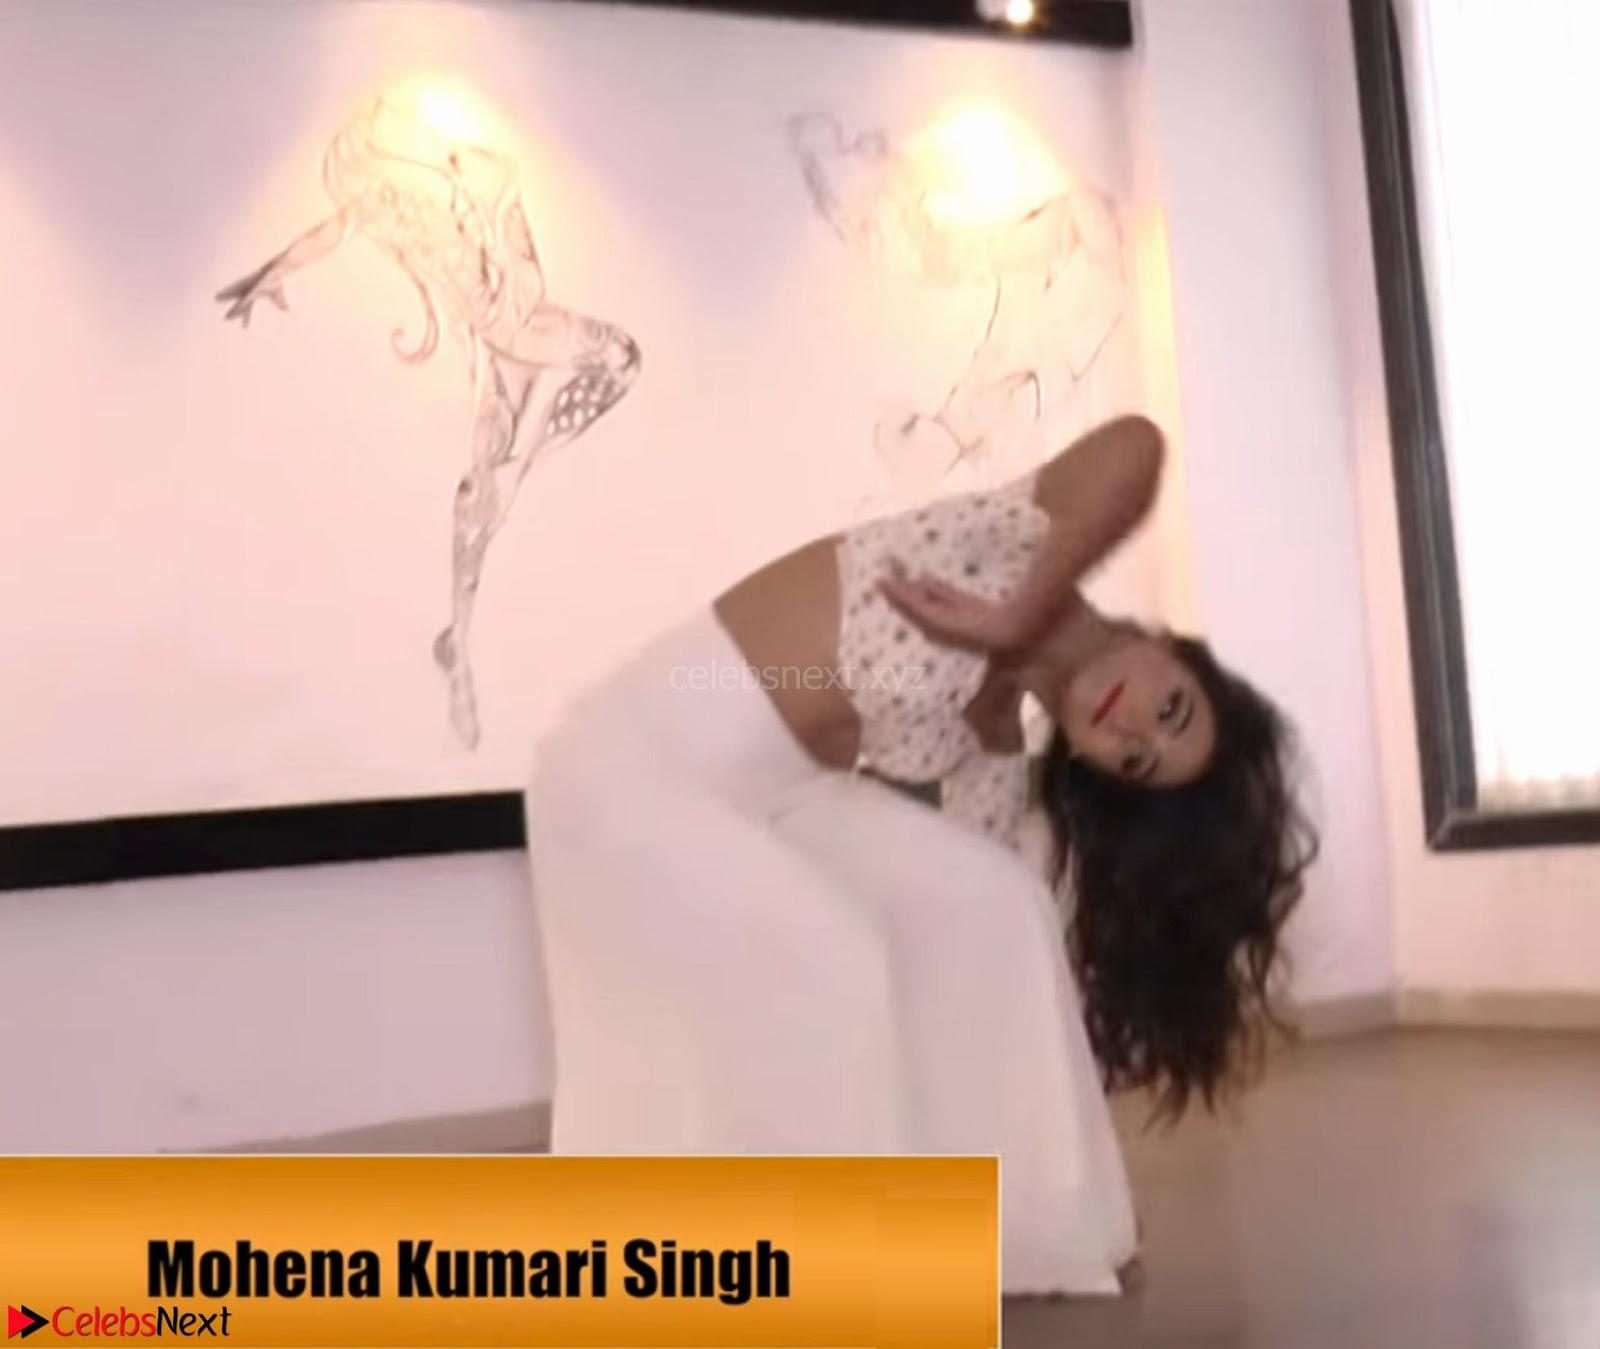 Mohena Kumari Singh actress from tv show yeh Rishta Kya Kehlata Hei in White Choli ~ CelebsNext Exclusive